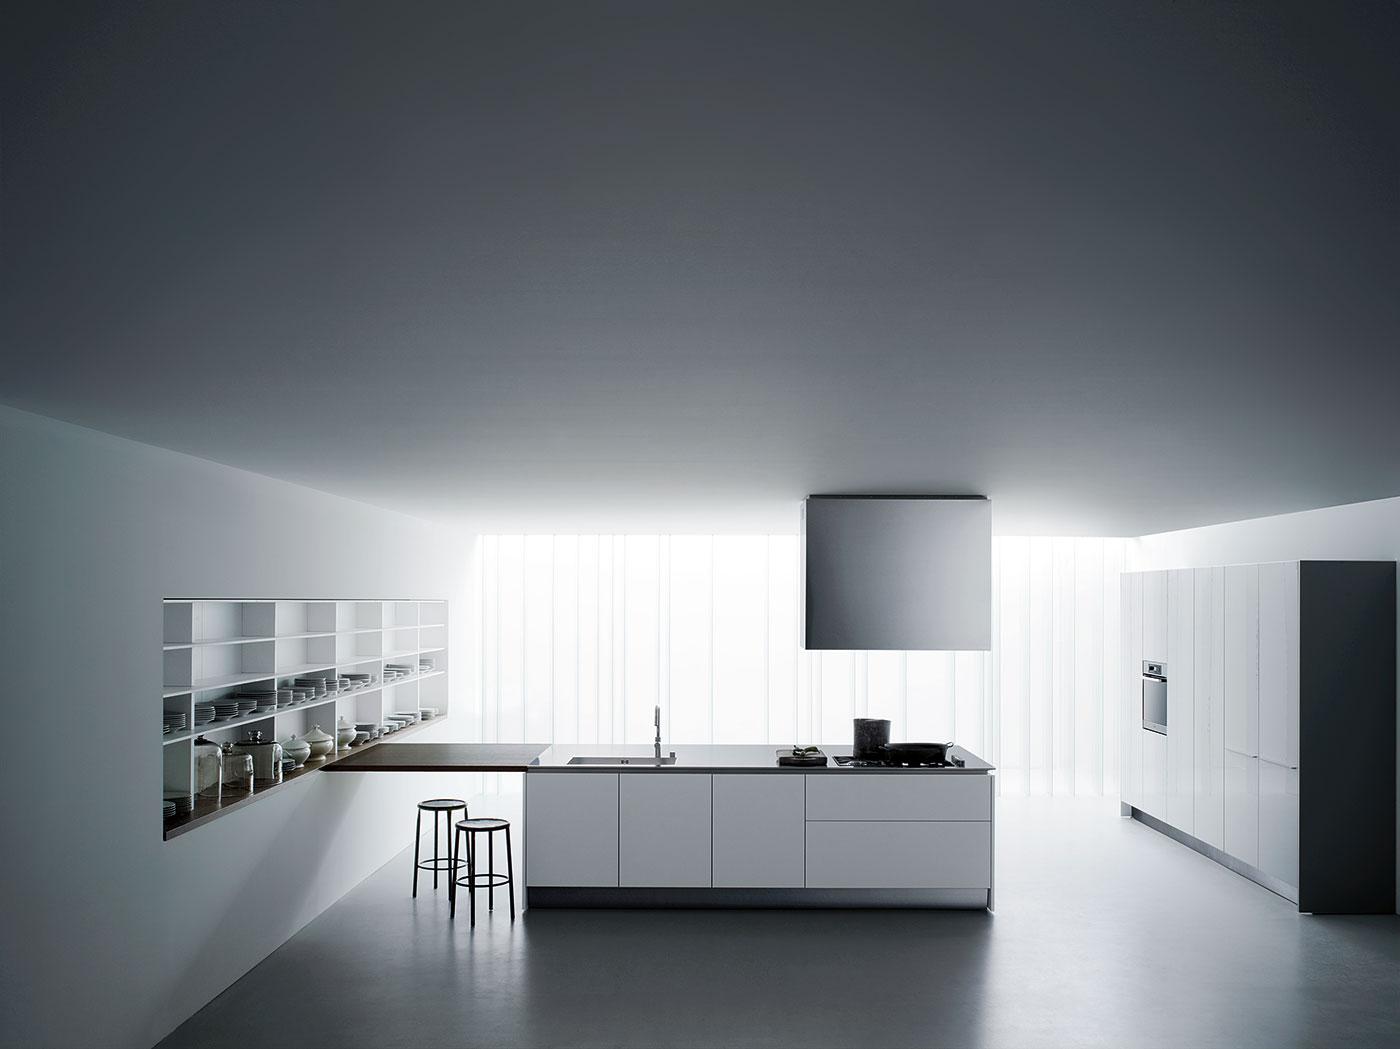 Obegi Home Boffi Xila ST 1 Overview By Tommasosartori High